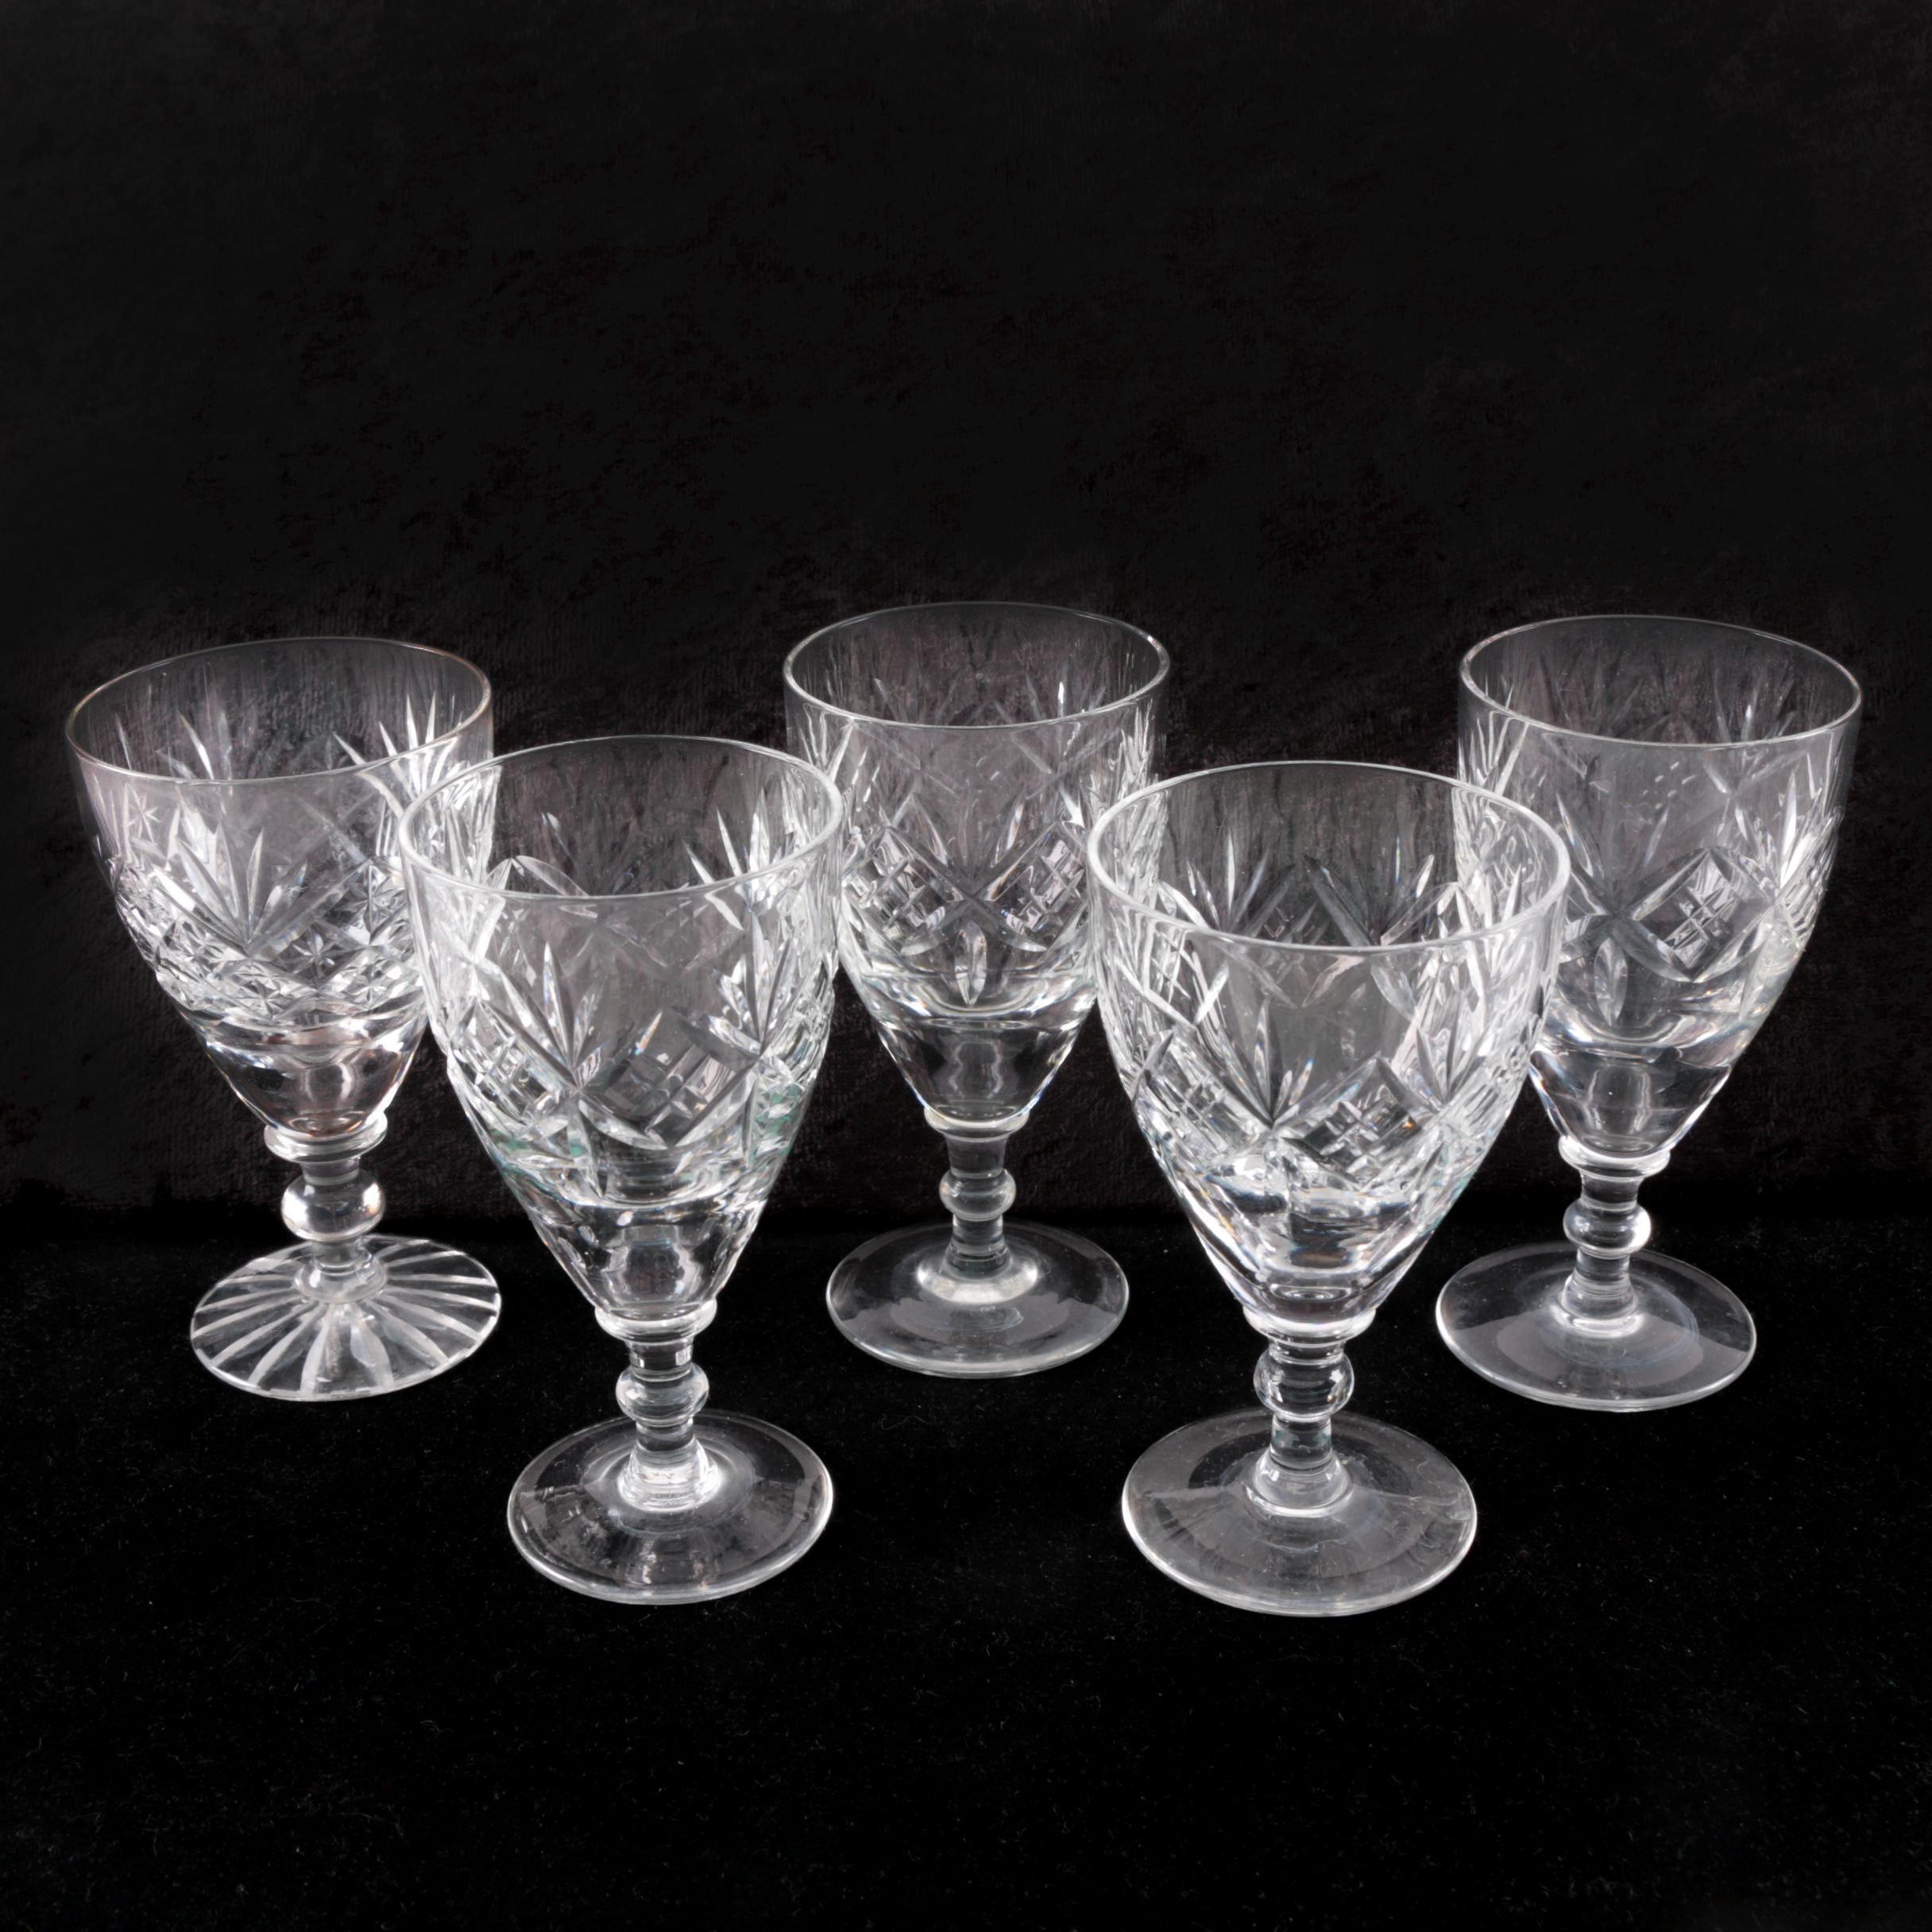 English Hand-Cut Cordial Glasses including Webb Corbett